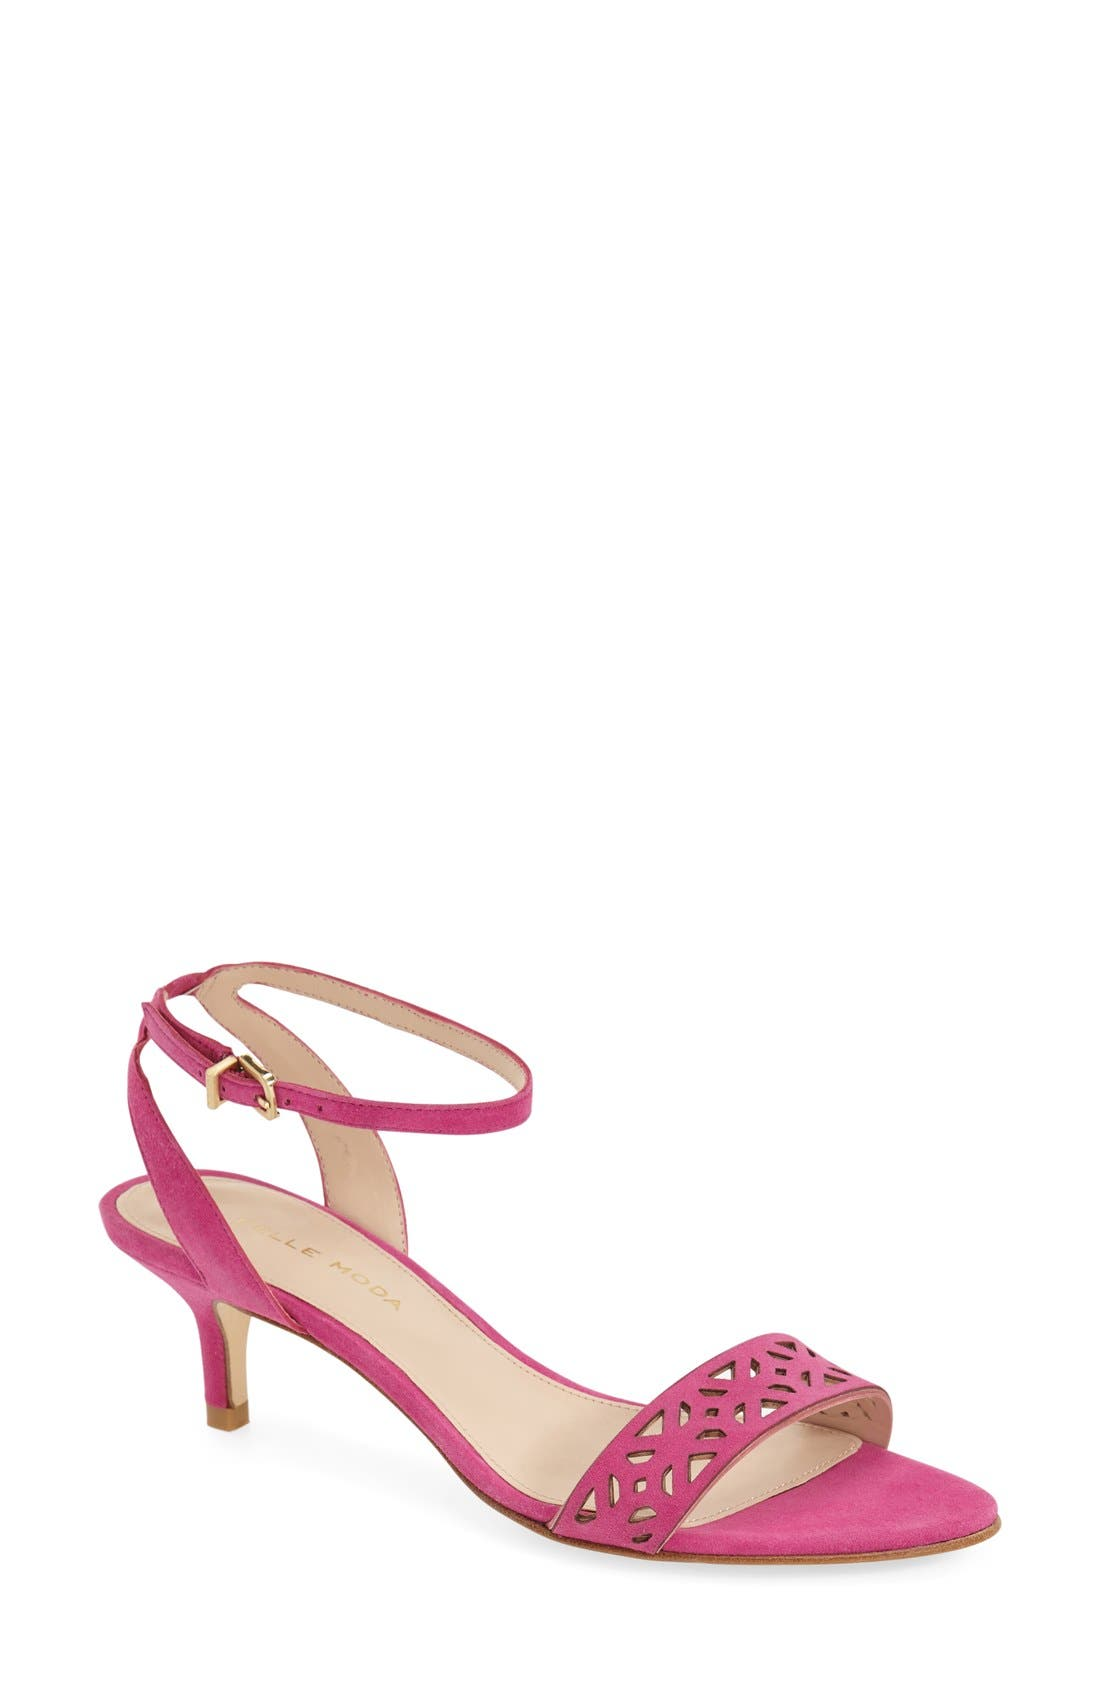 'Otis' Ankle Strap Sandal,                             Main thumbnail 1, color,                             Sugarplum